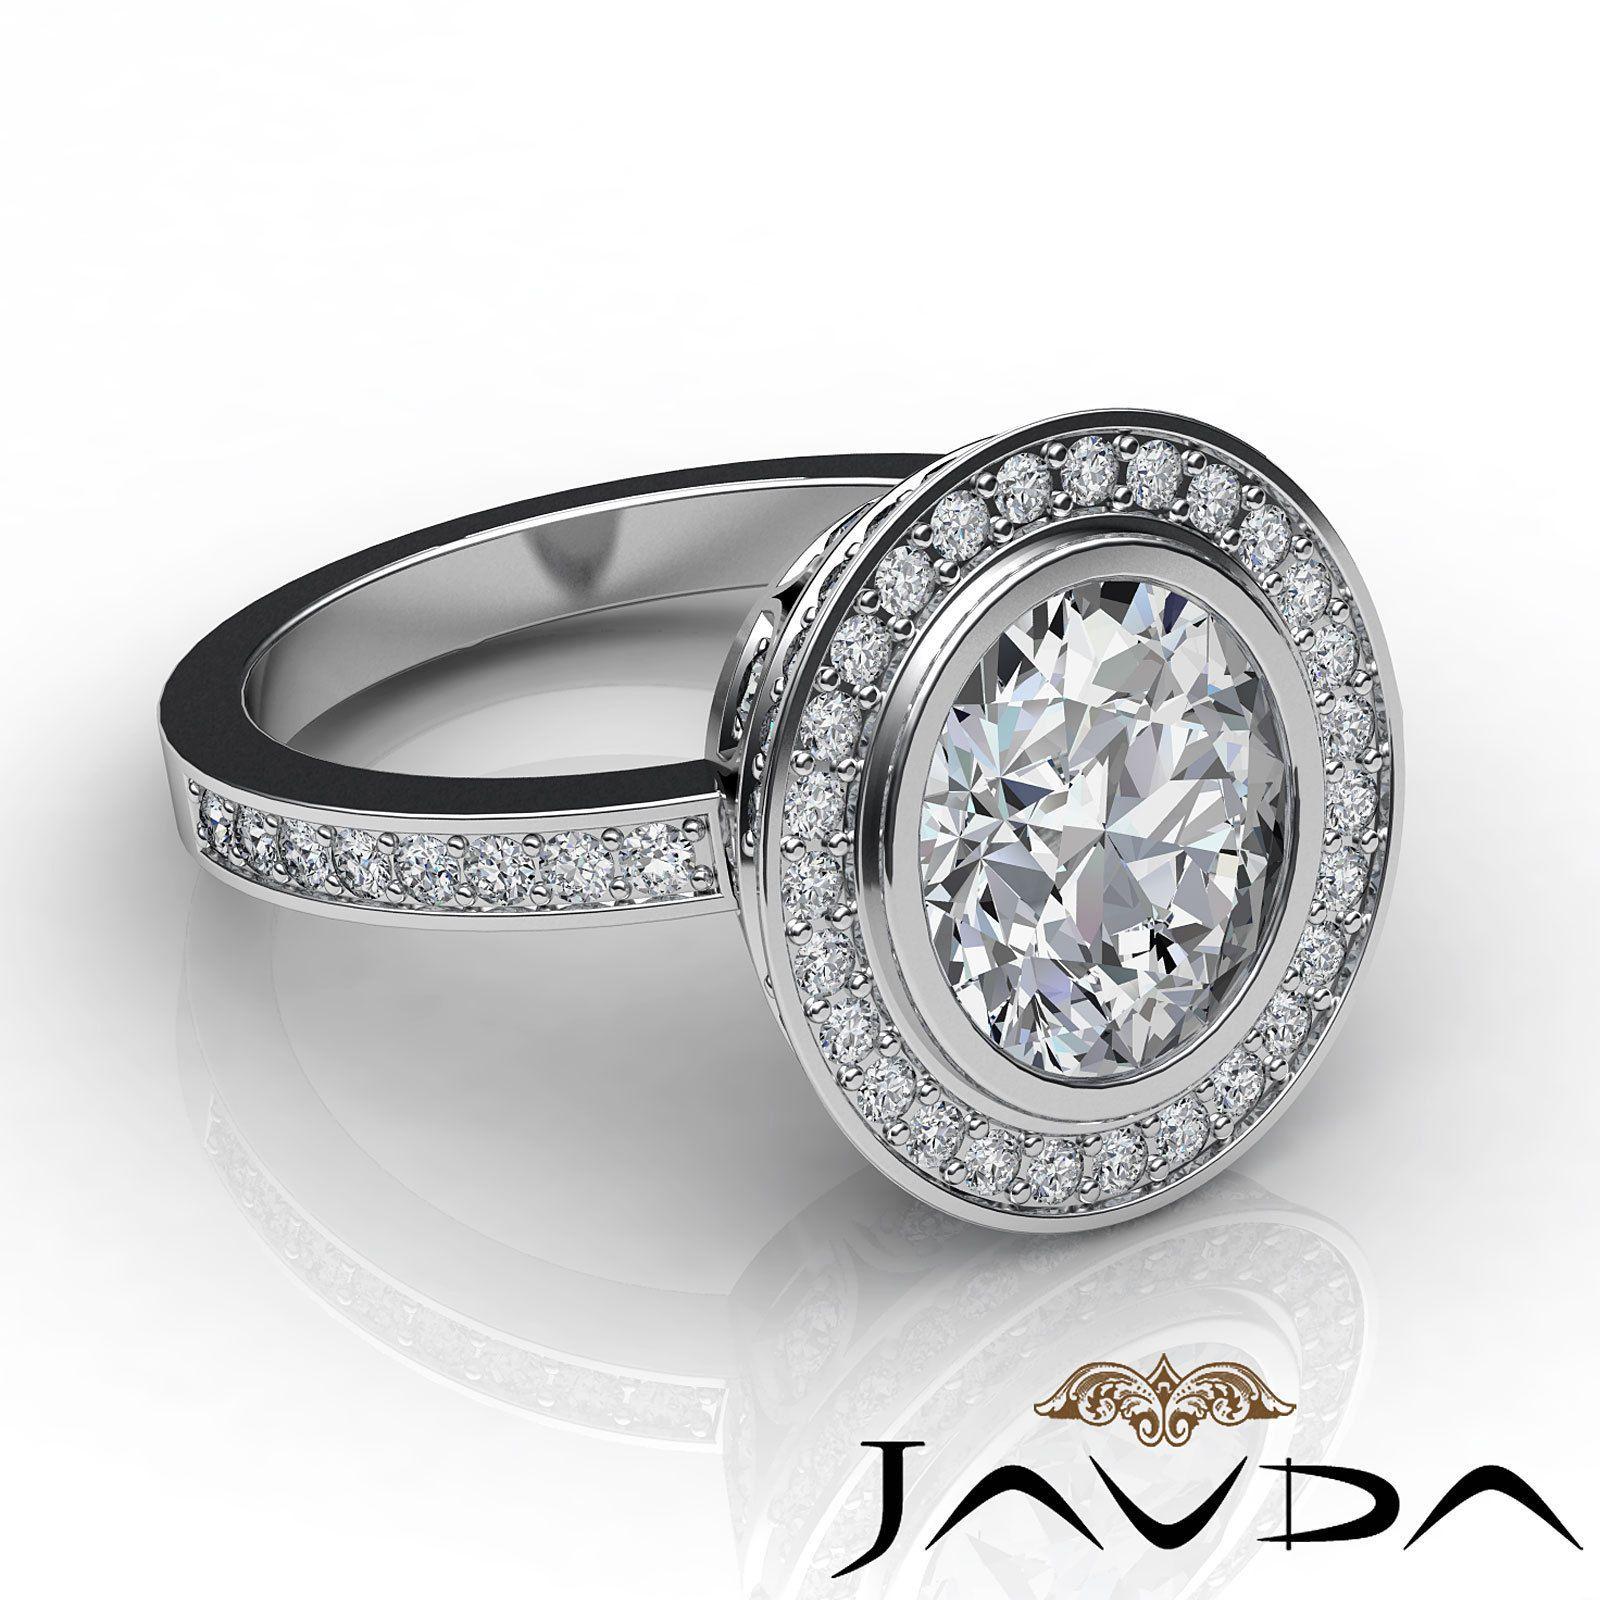 2 25 Ct Genuine Oval Cut Diamond Engagement Halo Ring 14k White Gold F VS2 GIA | eBay